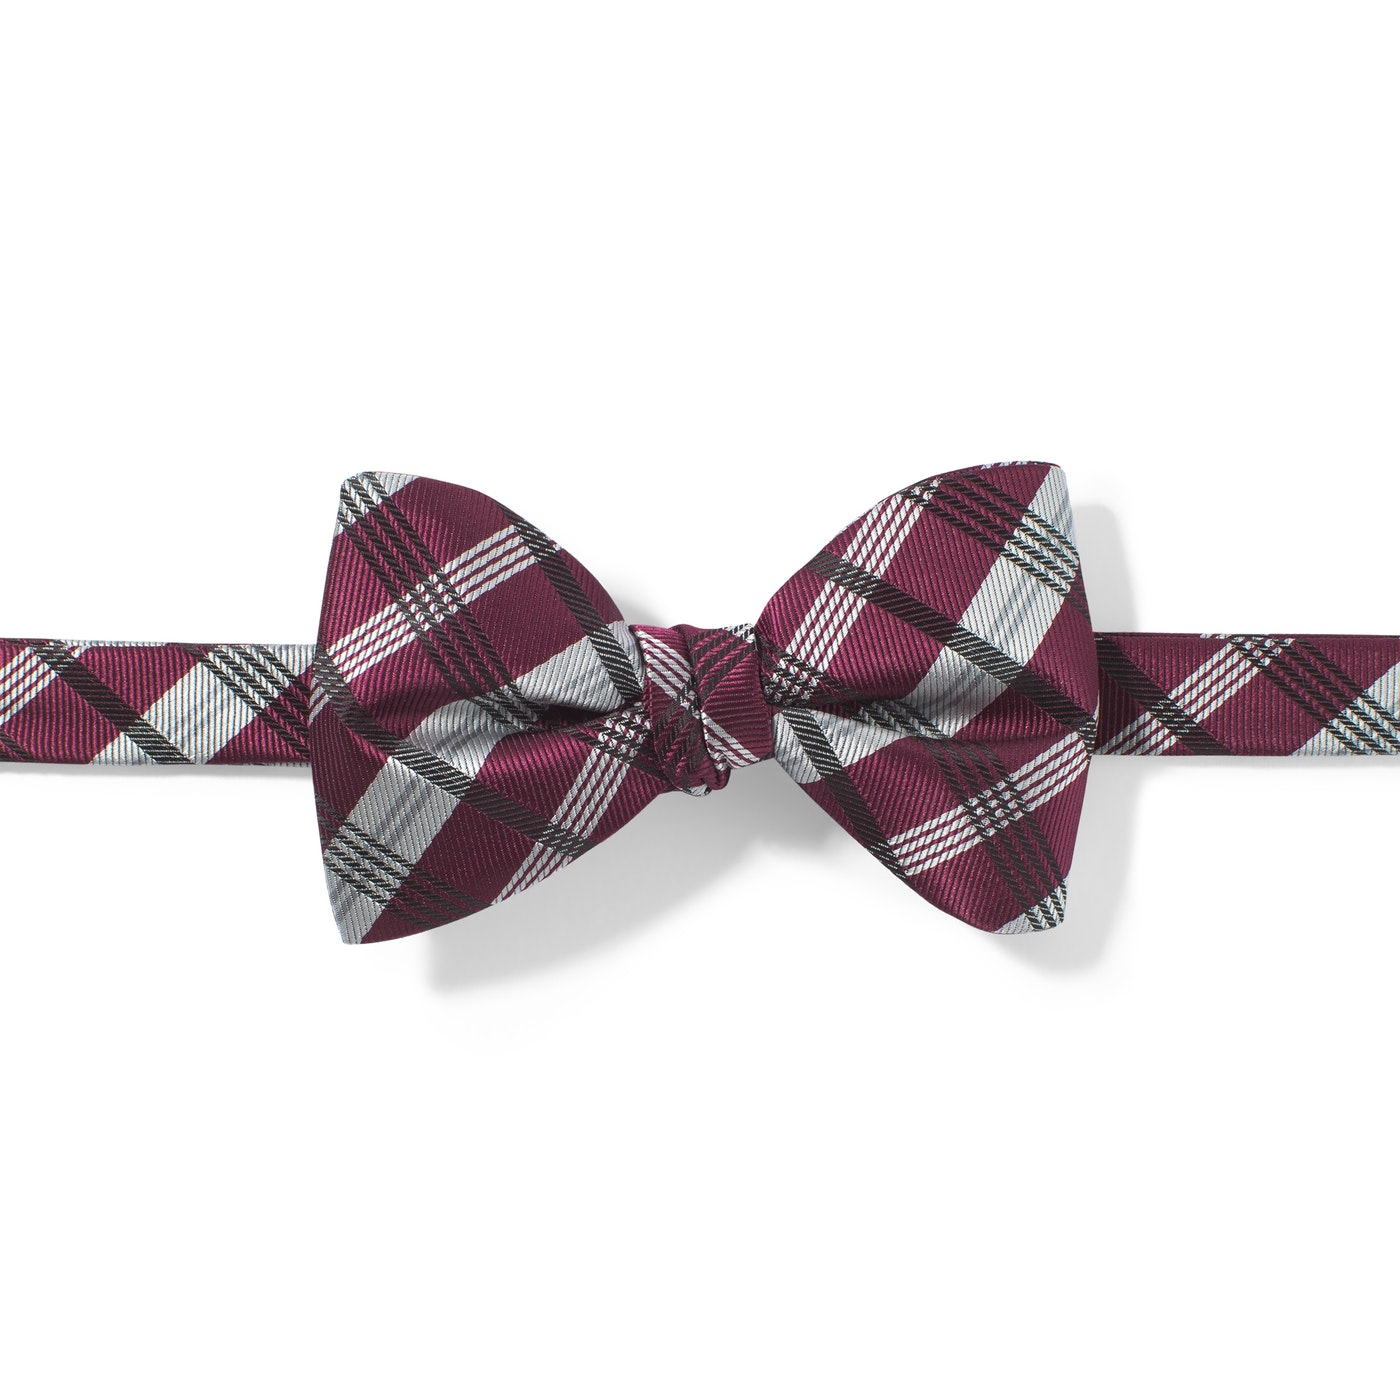 Wine-Sangria Plaid Pre-Tied Bow Tie